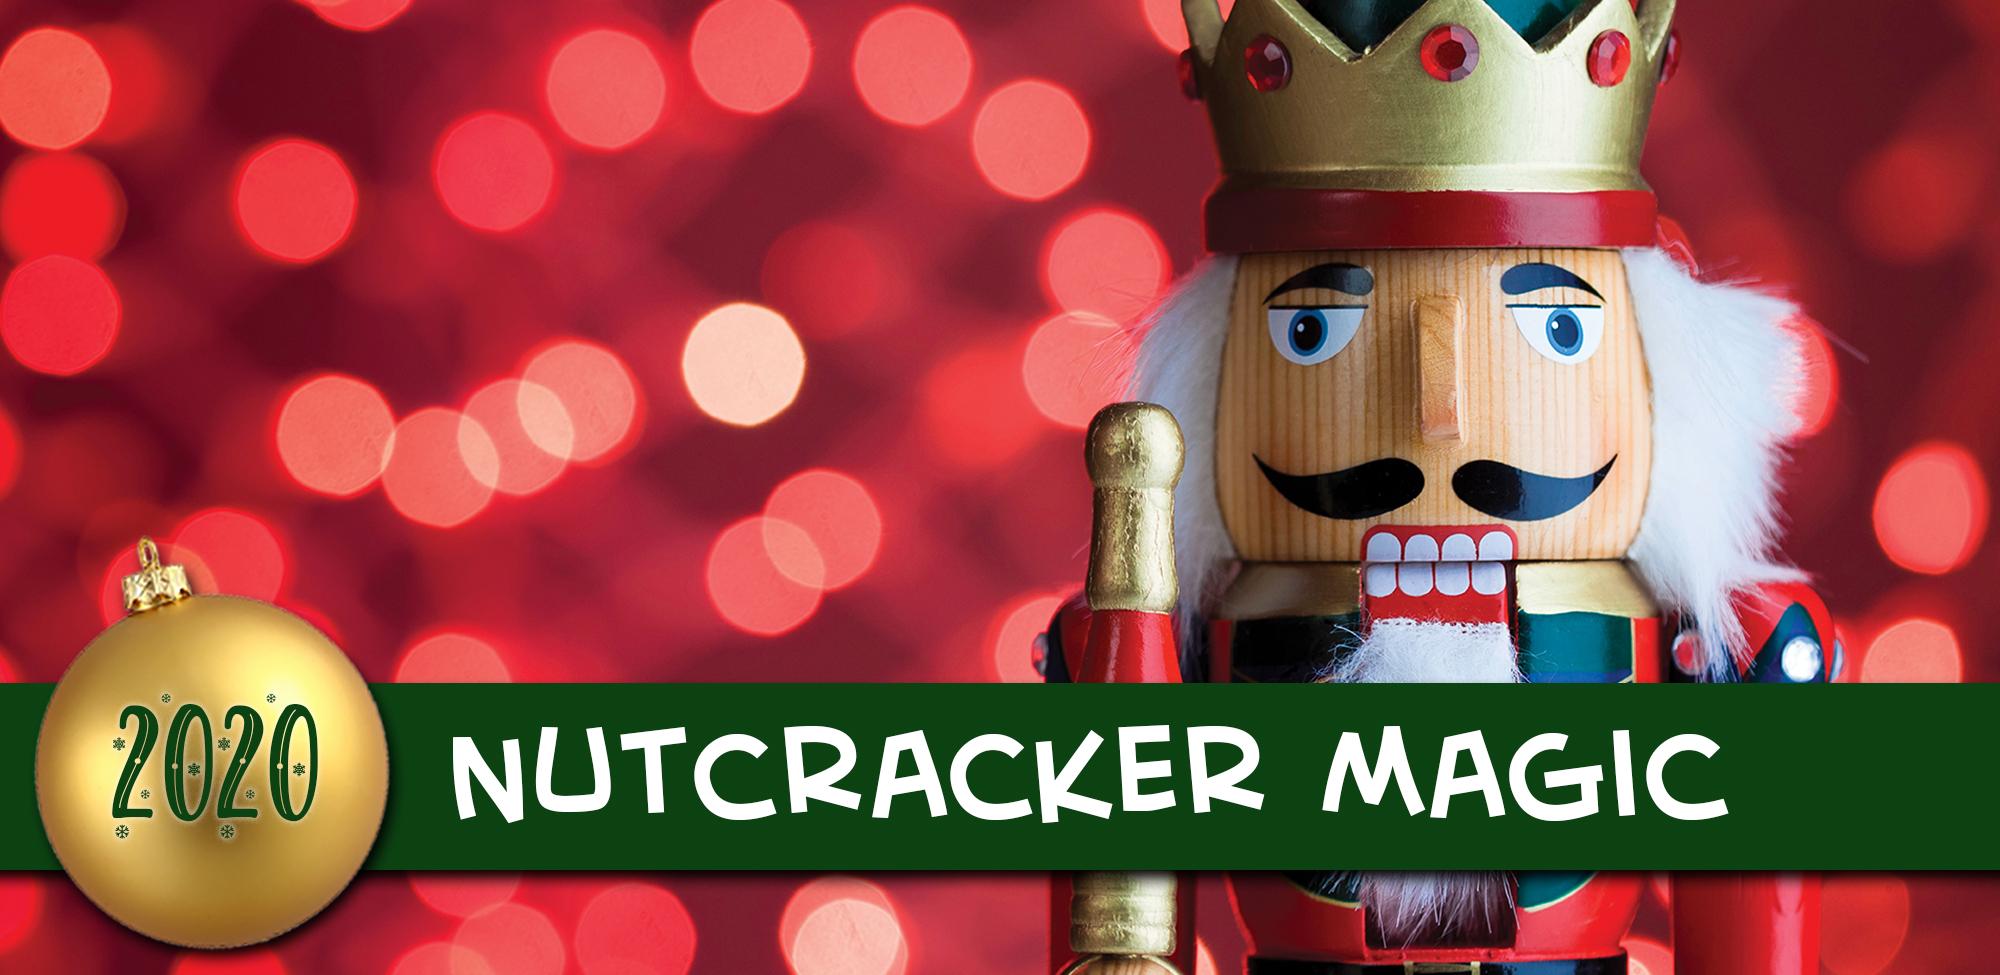 2020 Nutcracker Magic